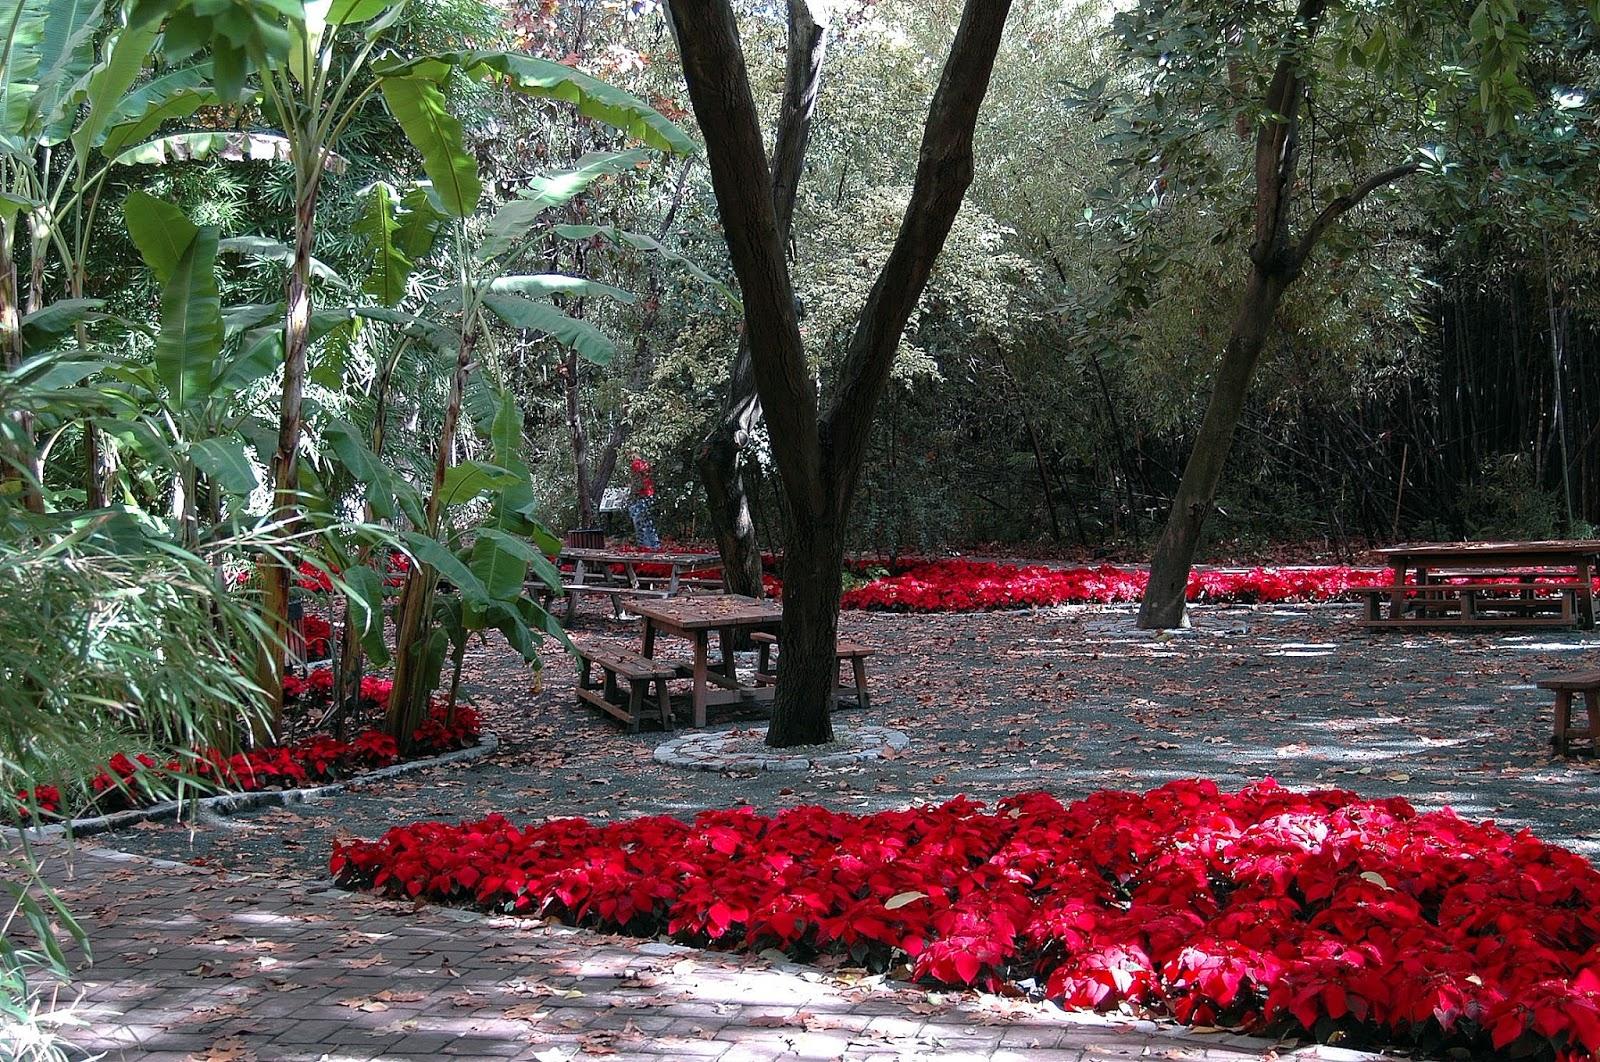 Floraciones en m laga y m s oto o en el jard n bot nico for Jardin botanico el ejido